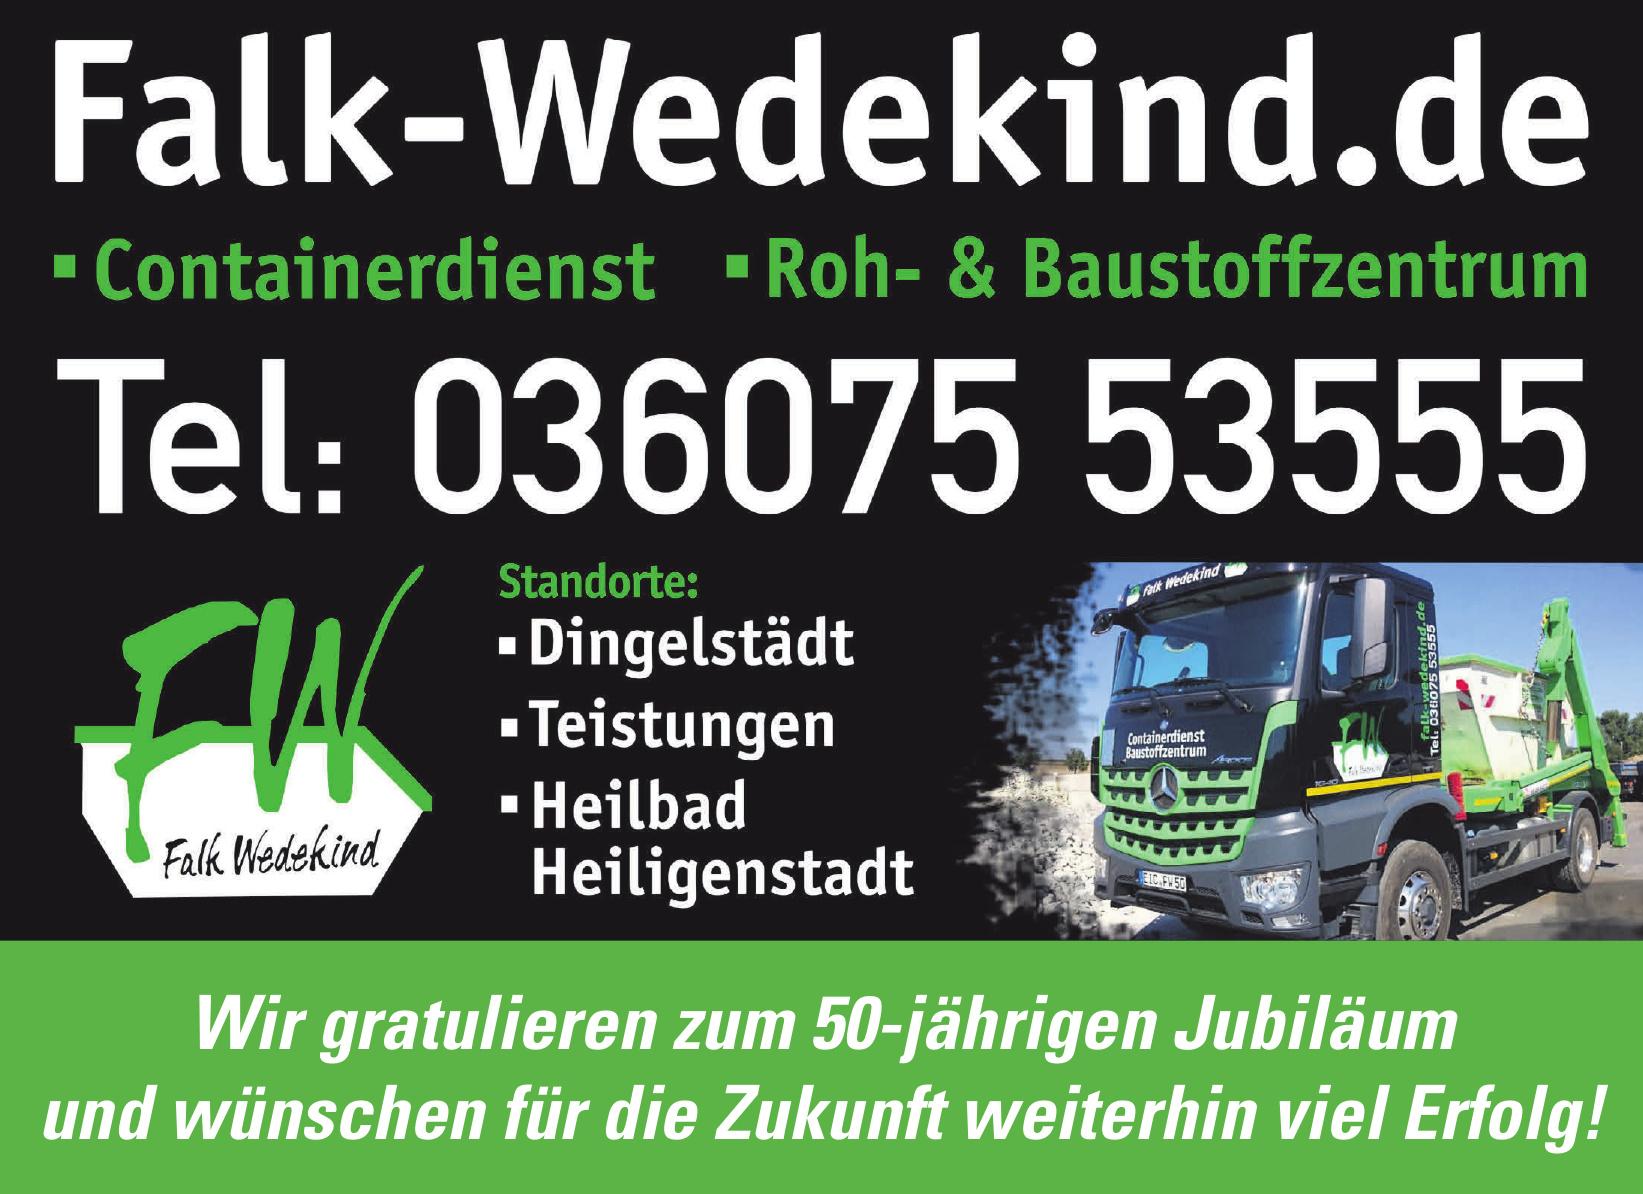 Falk Wedekind